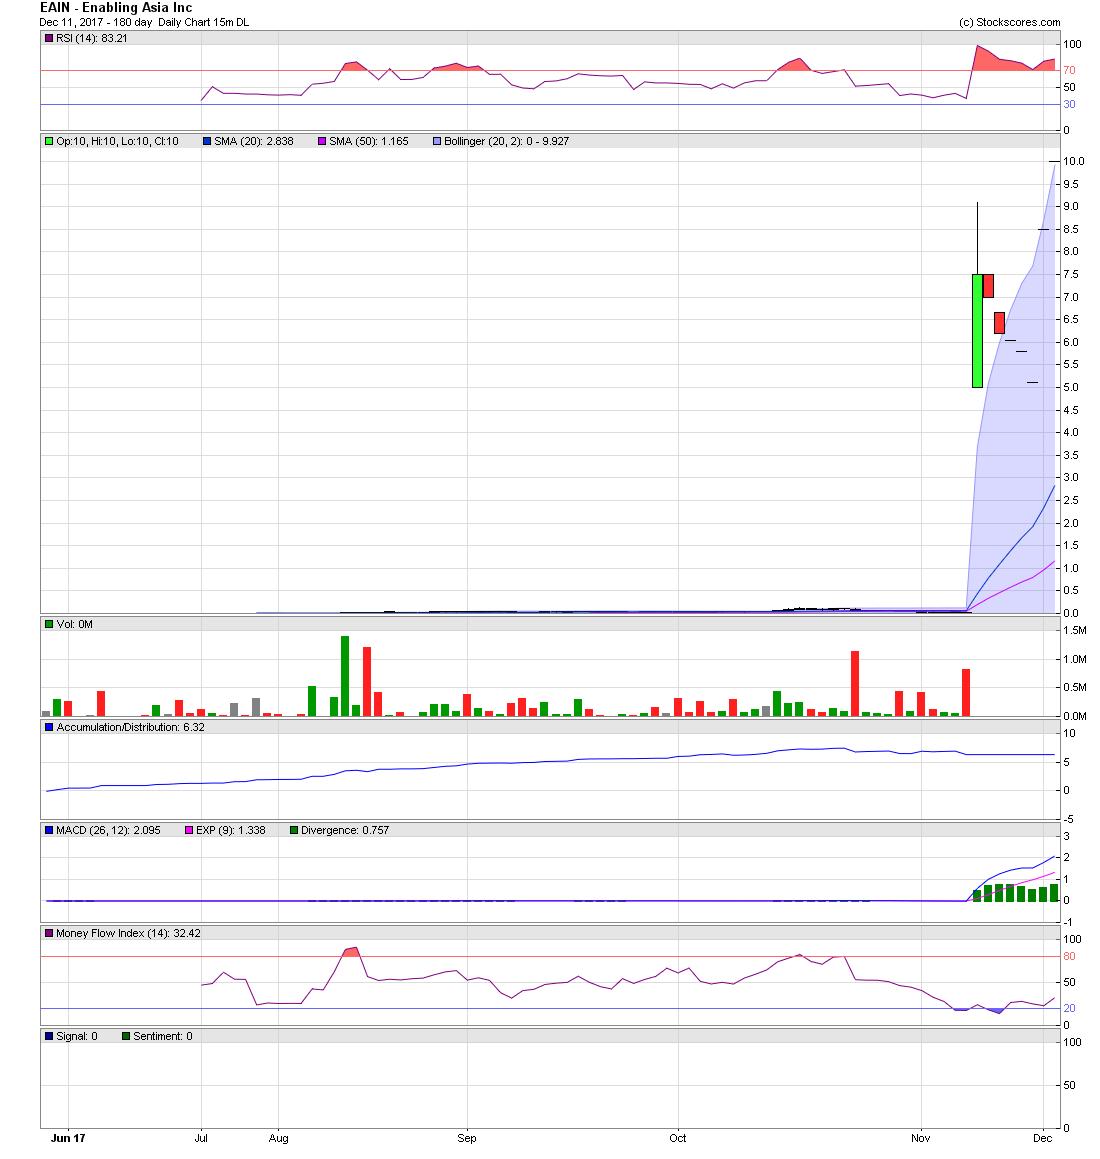 Enabling asia inc eain stock message board investorshub eain biocorpaavc Choice Image